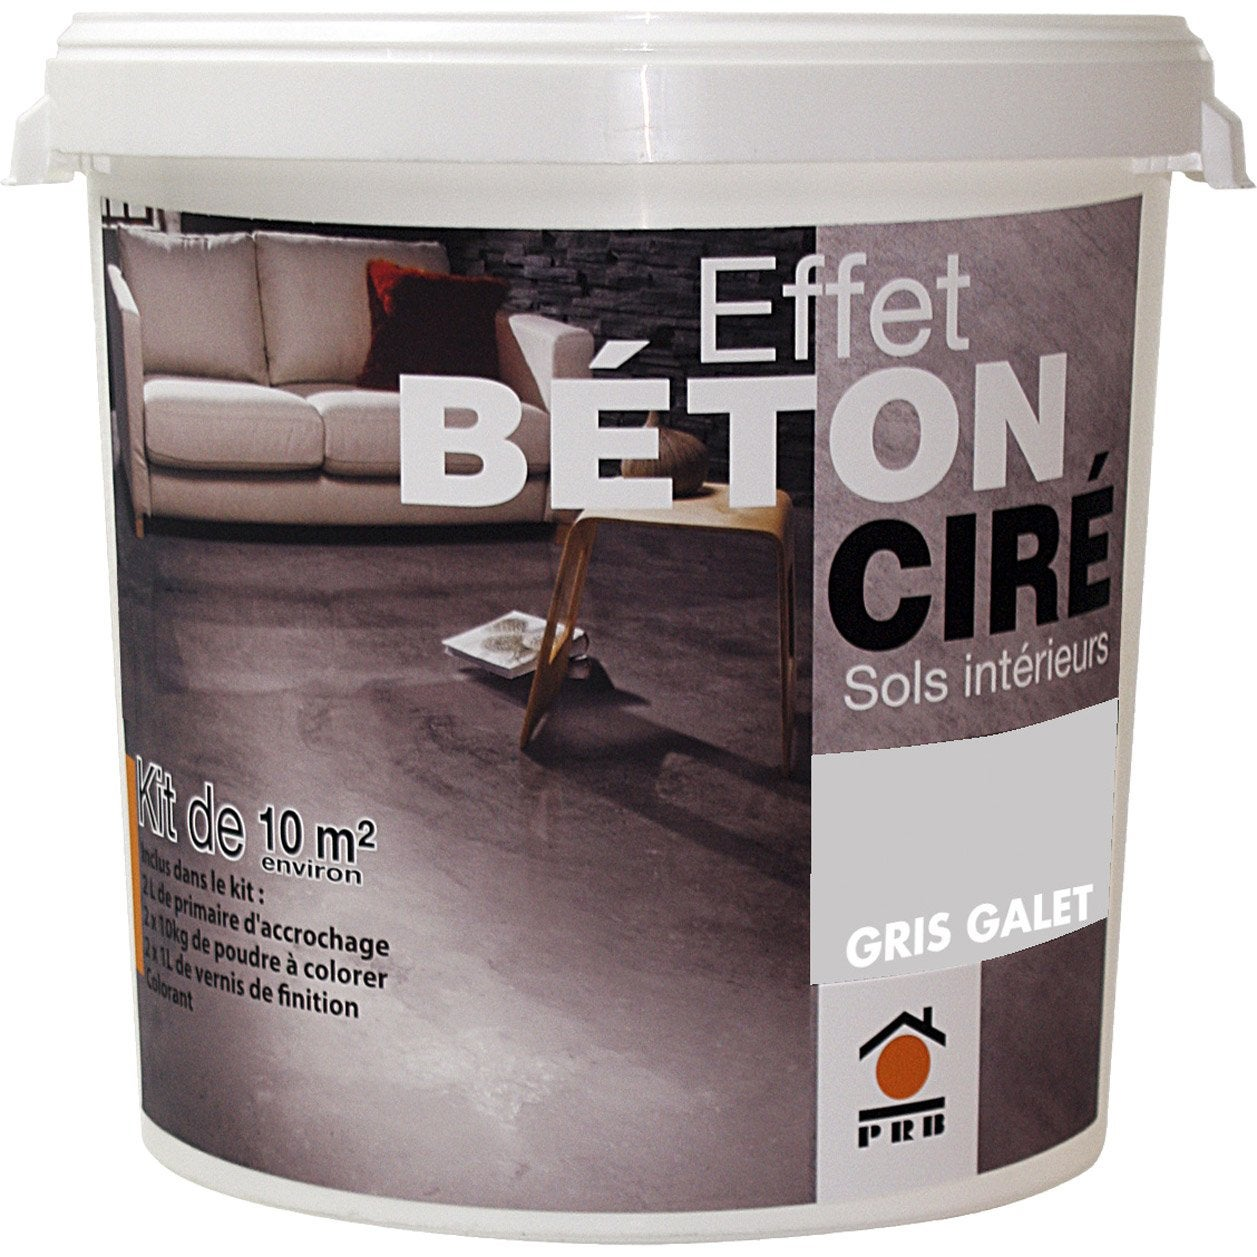 b ton effet cir gris galet prb 10m leroy merlin. Black Bedroom Furniture Sets. Home Design Ideas